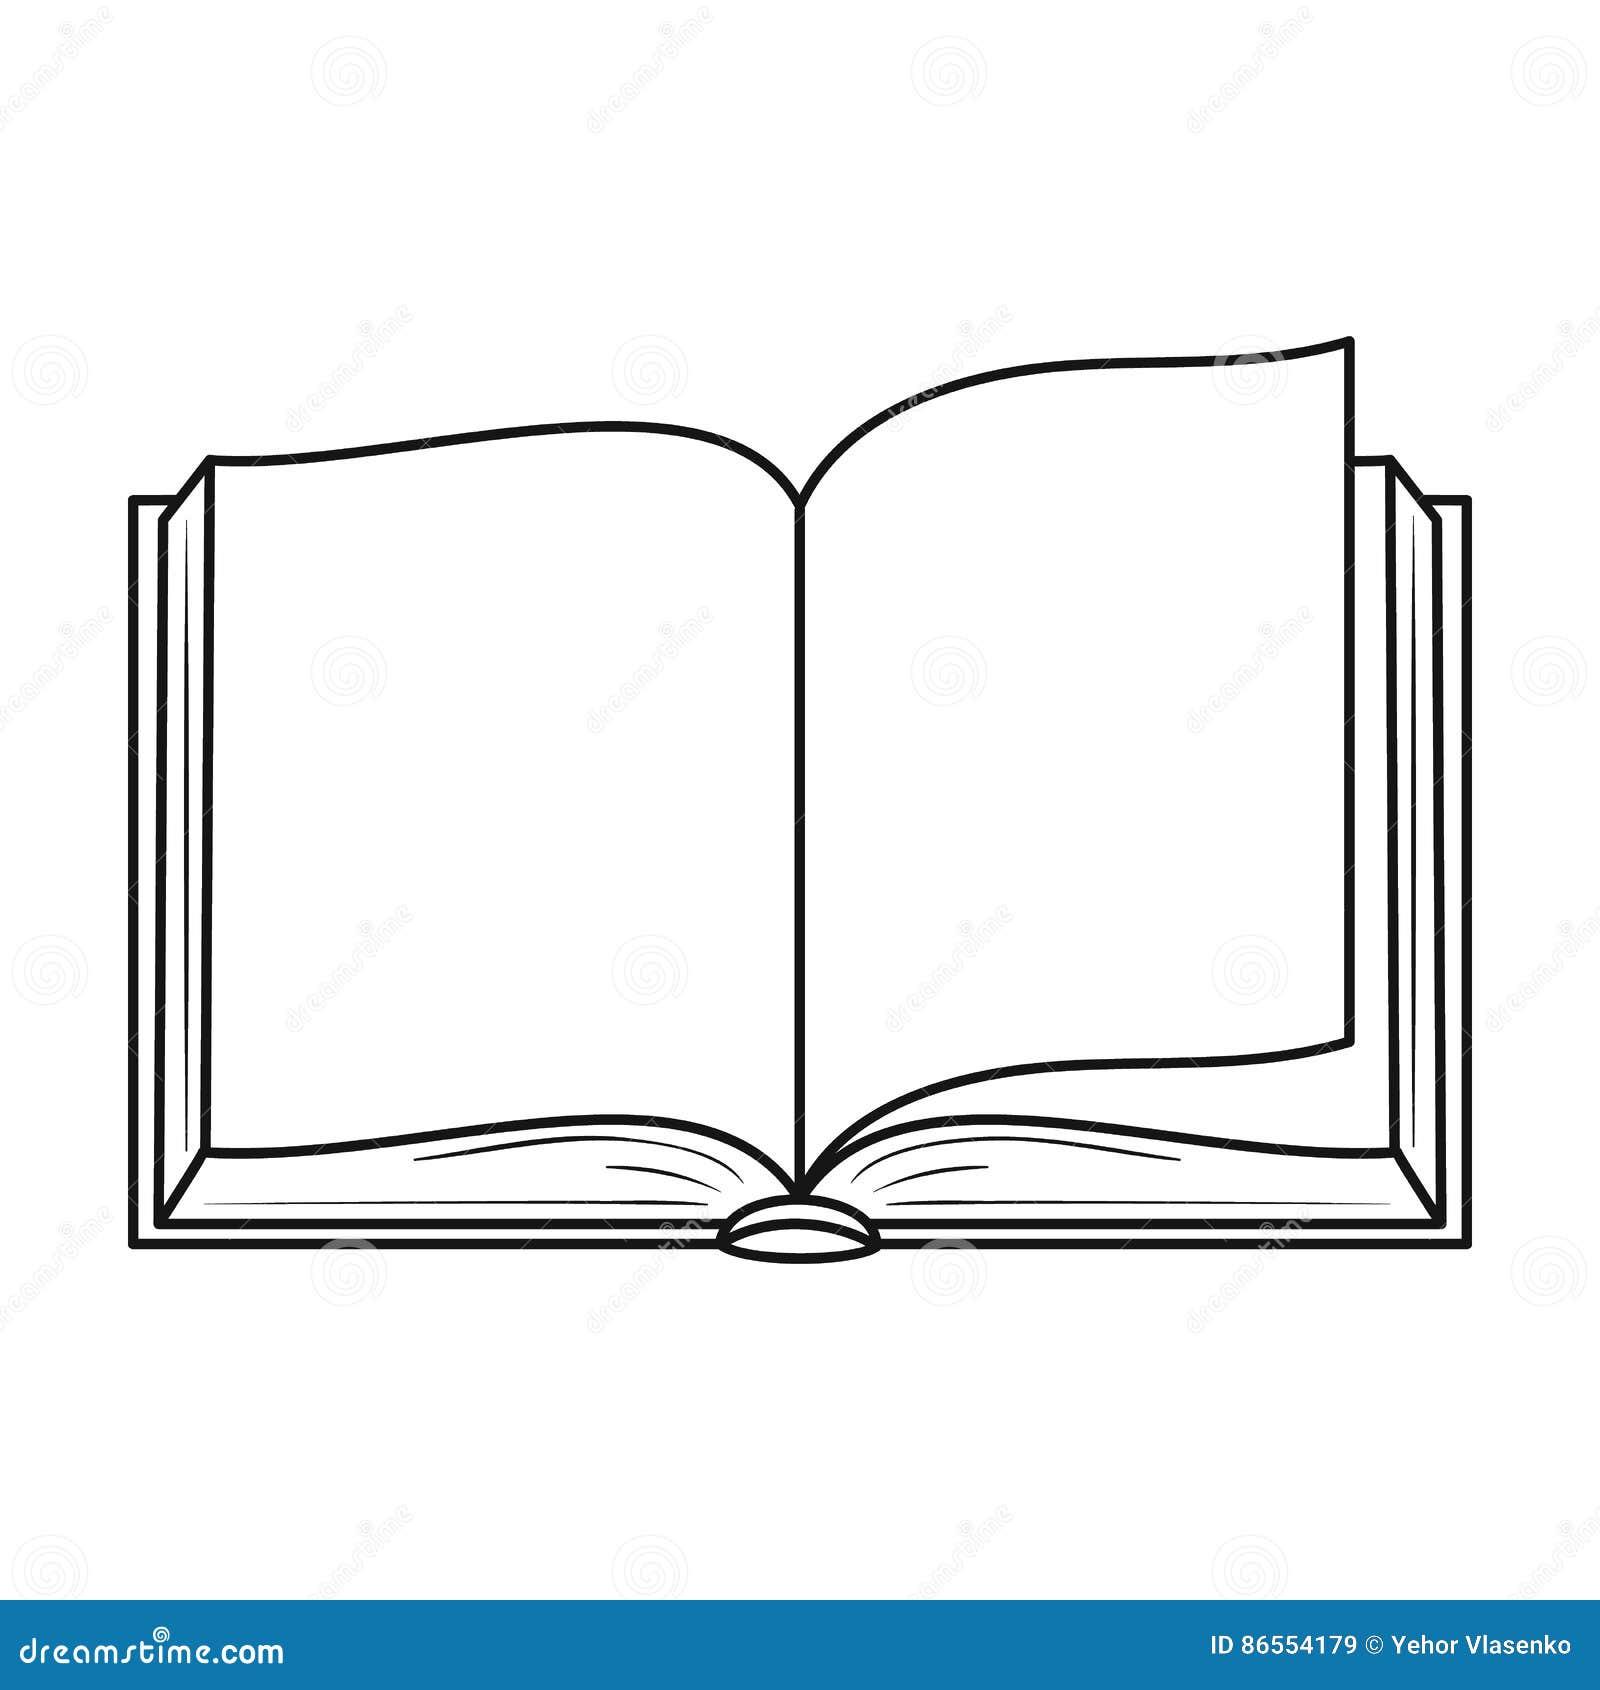 Author study outline